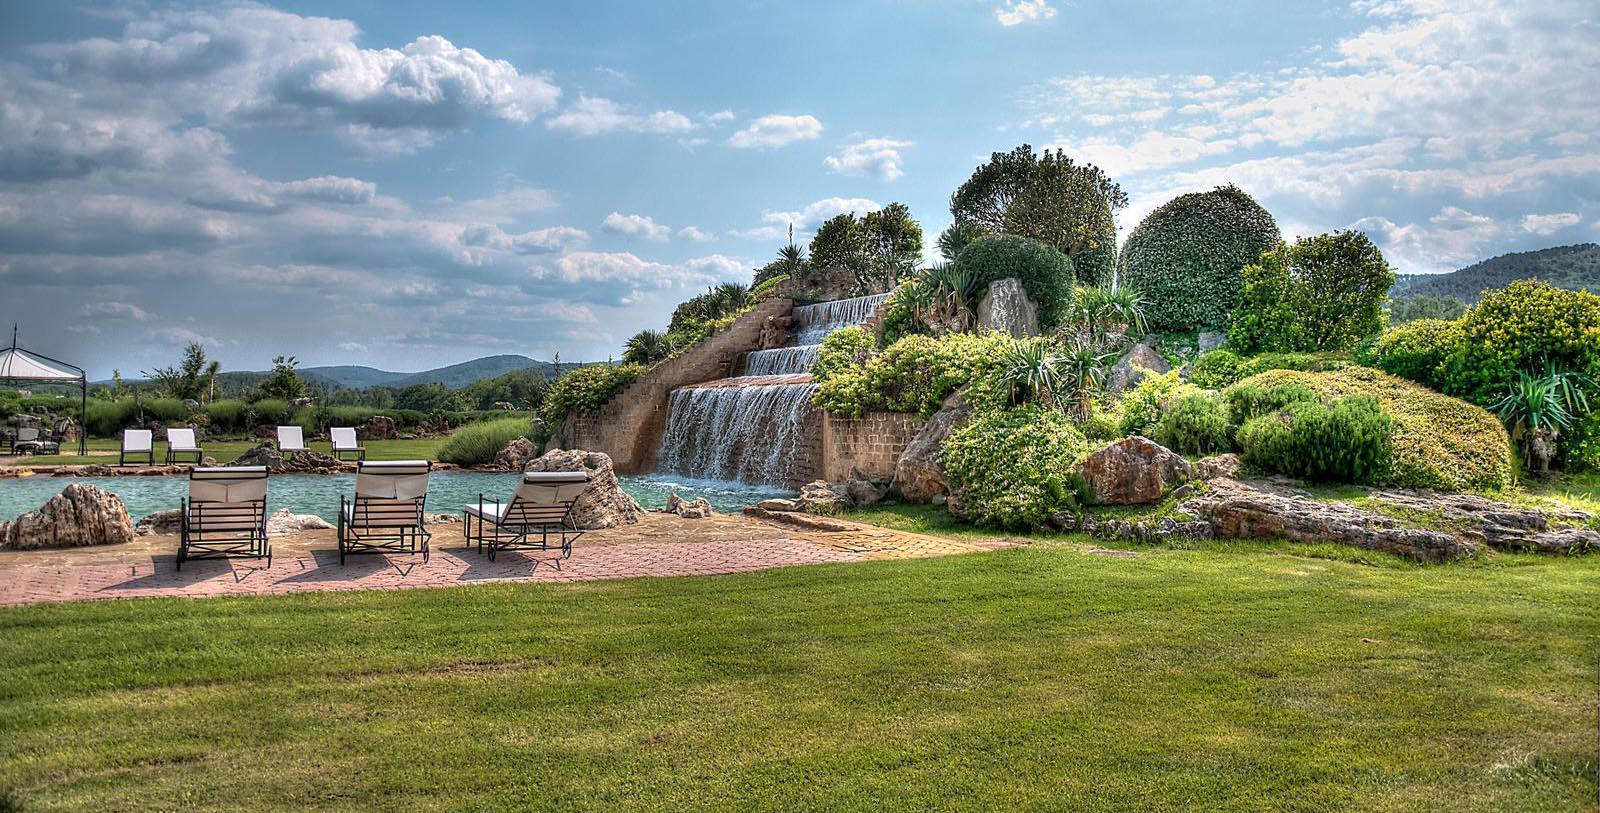 Discover the soothing thermal spring of Santa Caterina at La Bagnaia.